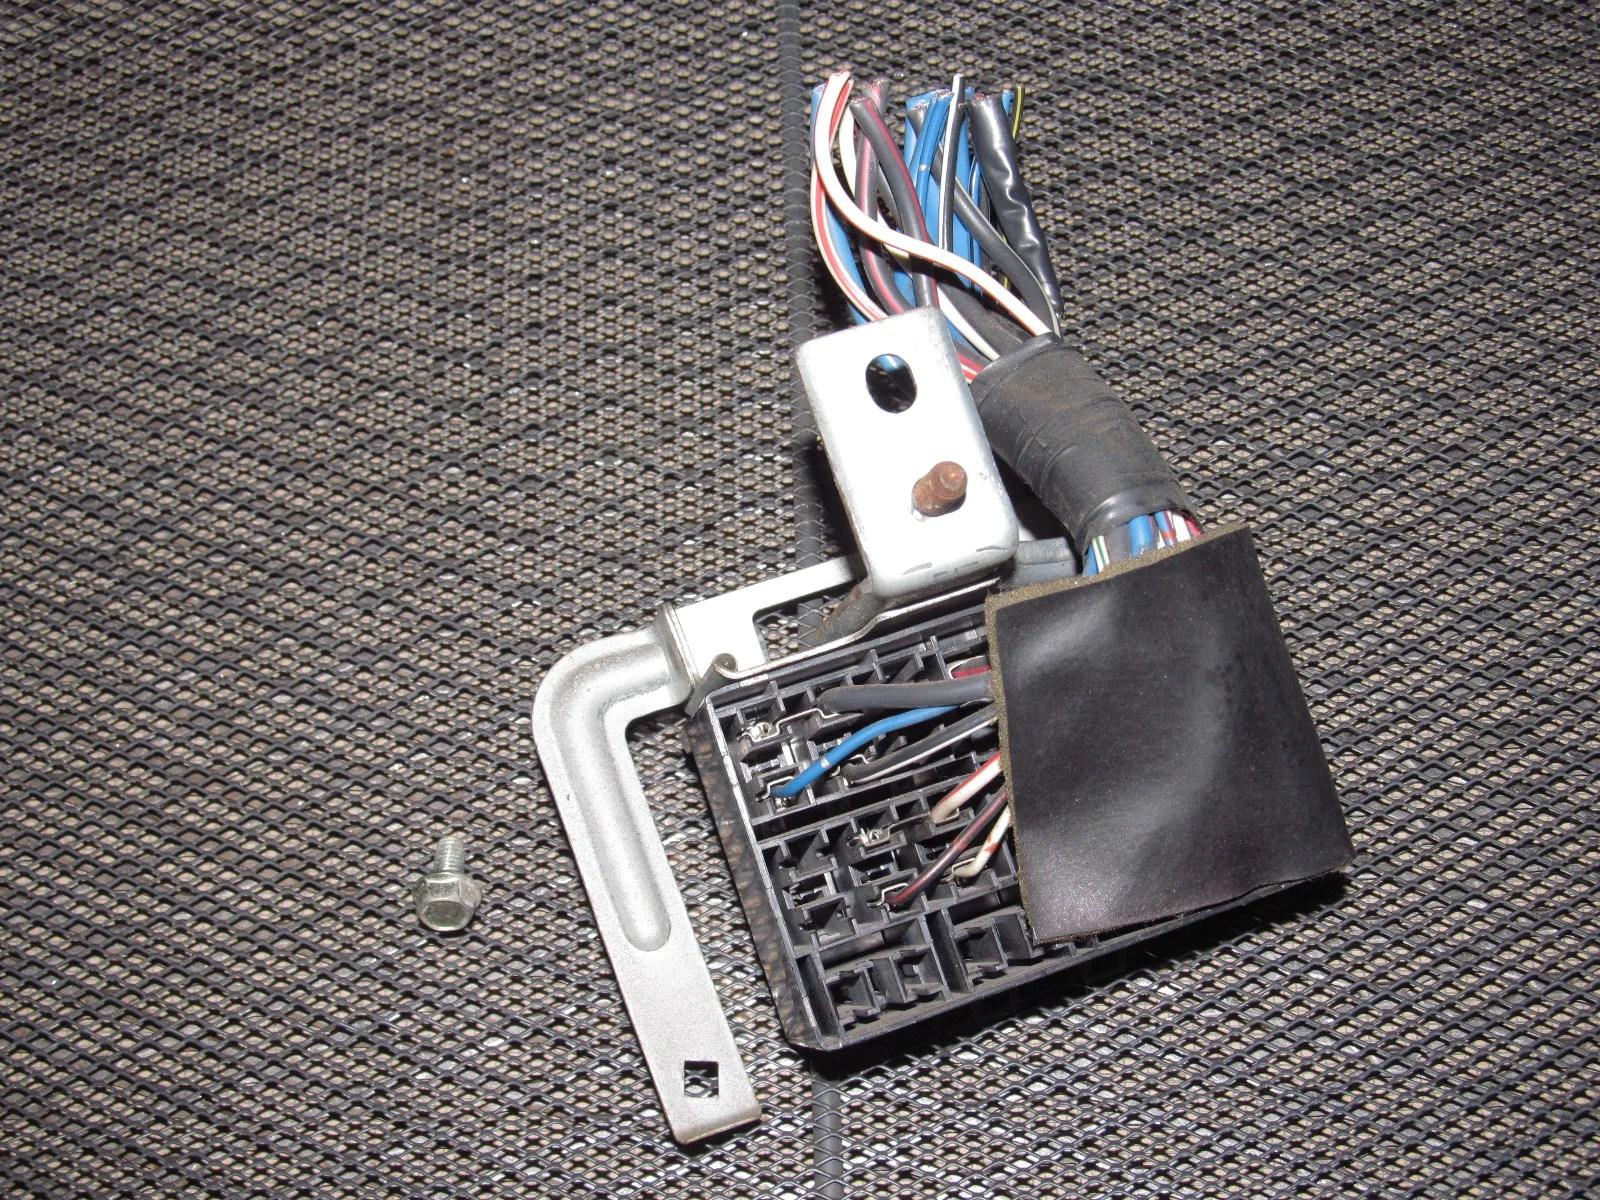 93 mazda miata fuse box wiring diagram mix 90 93 mazda miata oem dash interior fuse [ 1600 x 1200 Pixel ]